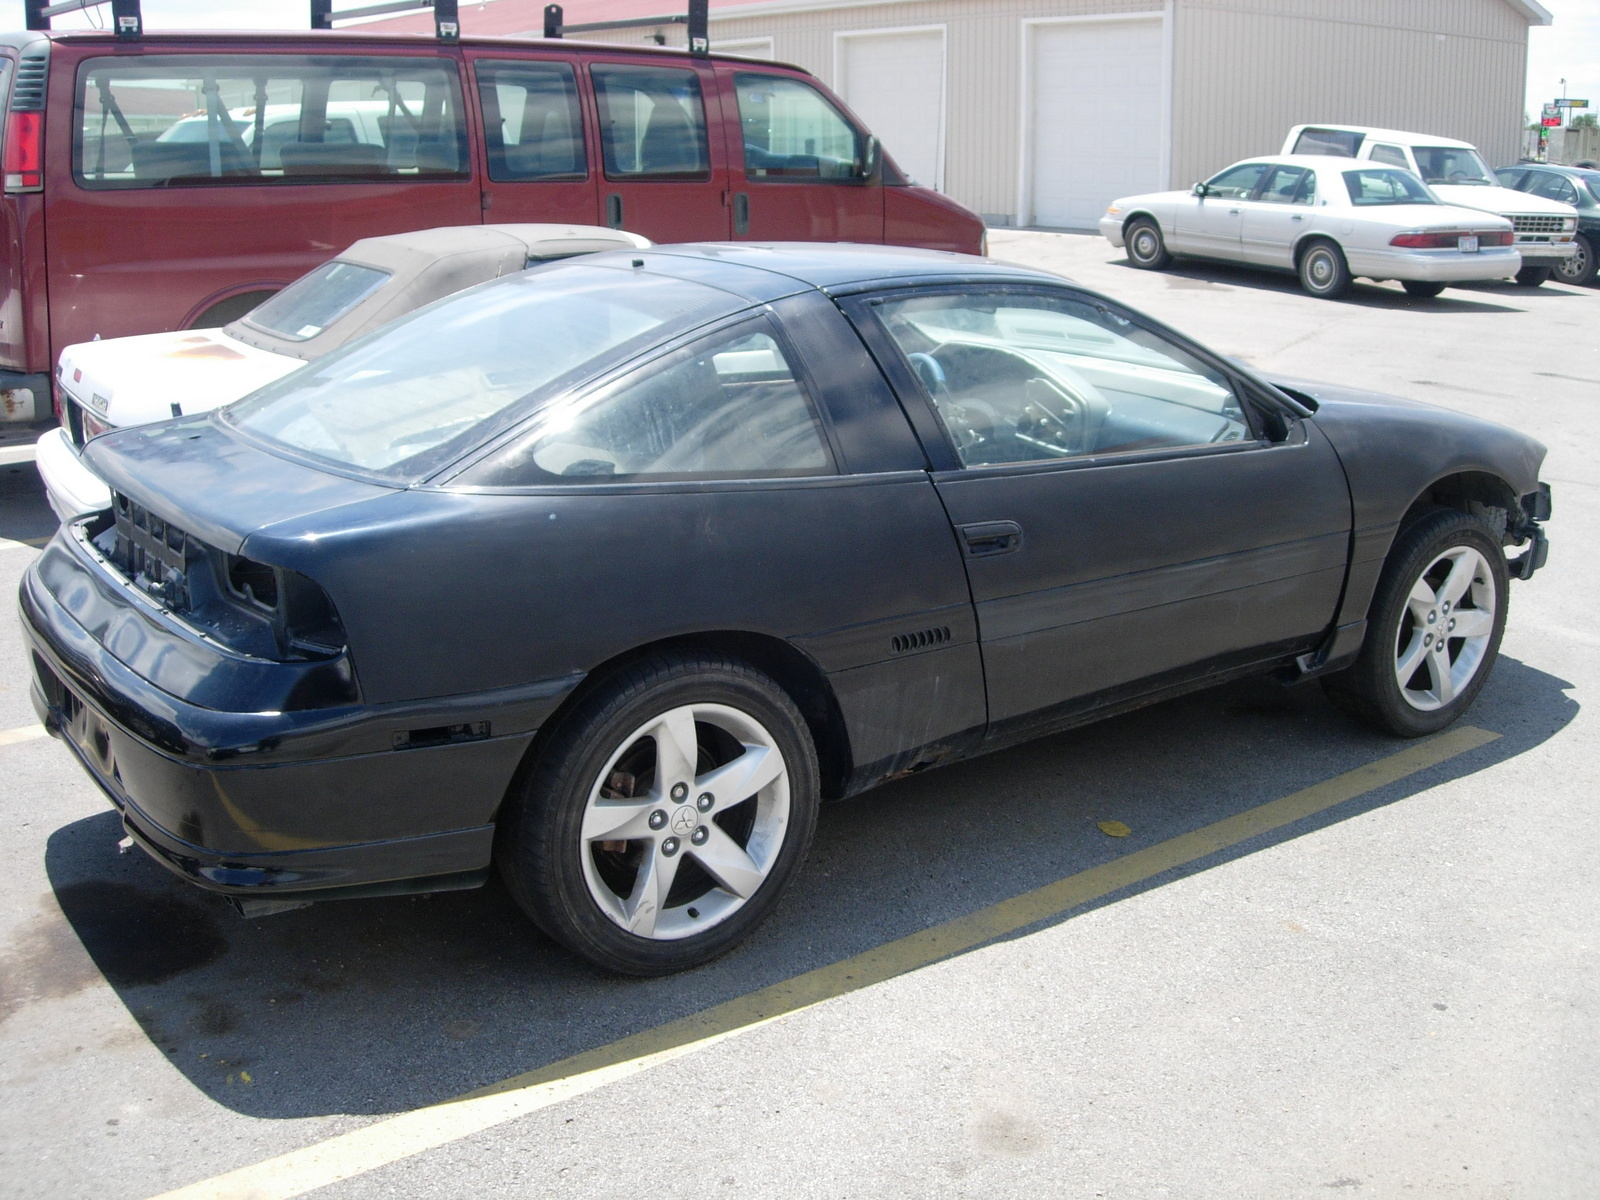 Dr Eclipse Turbo Mitsubishi Mitsubishi Eclipse Gst Gst 1998 2 1998